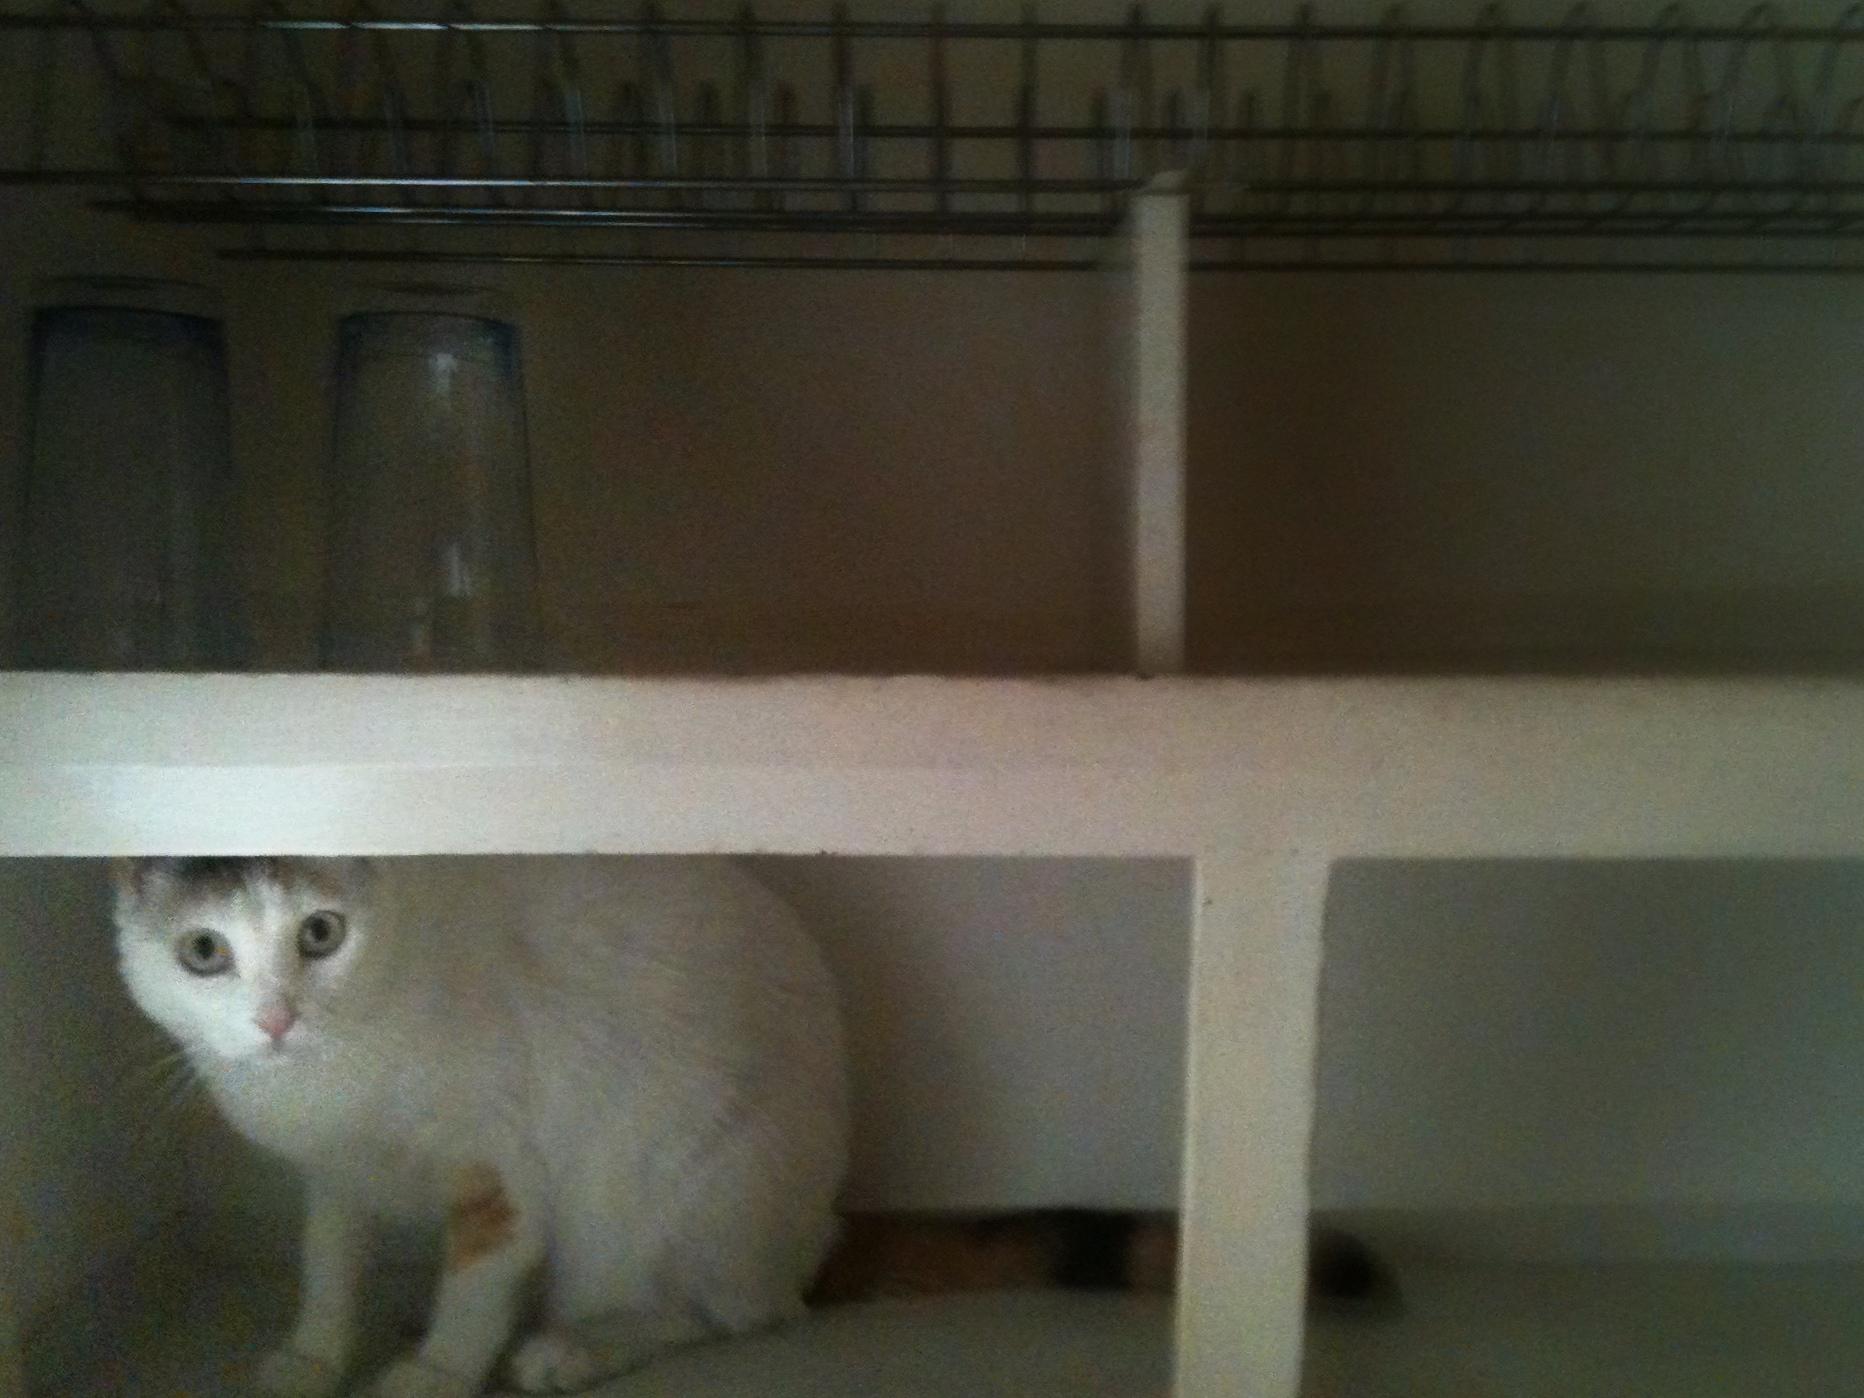 toupee in the cupboard